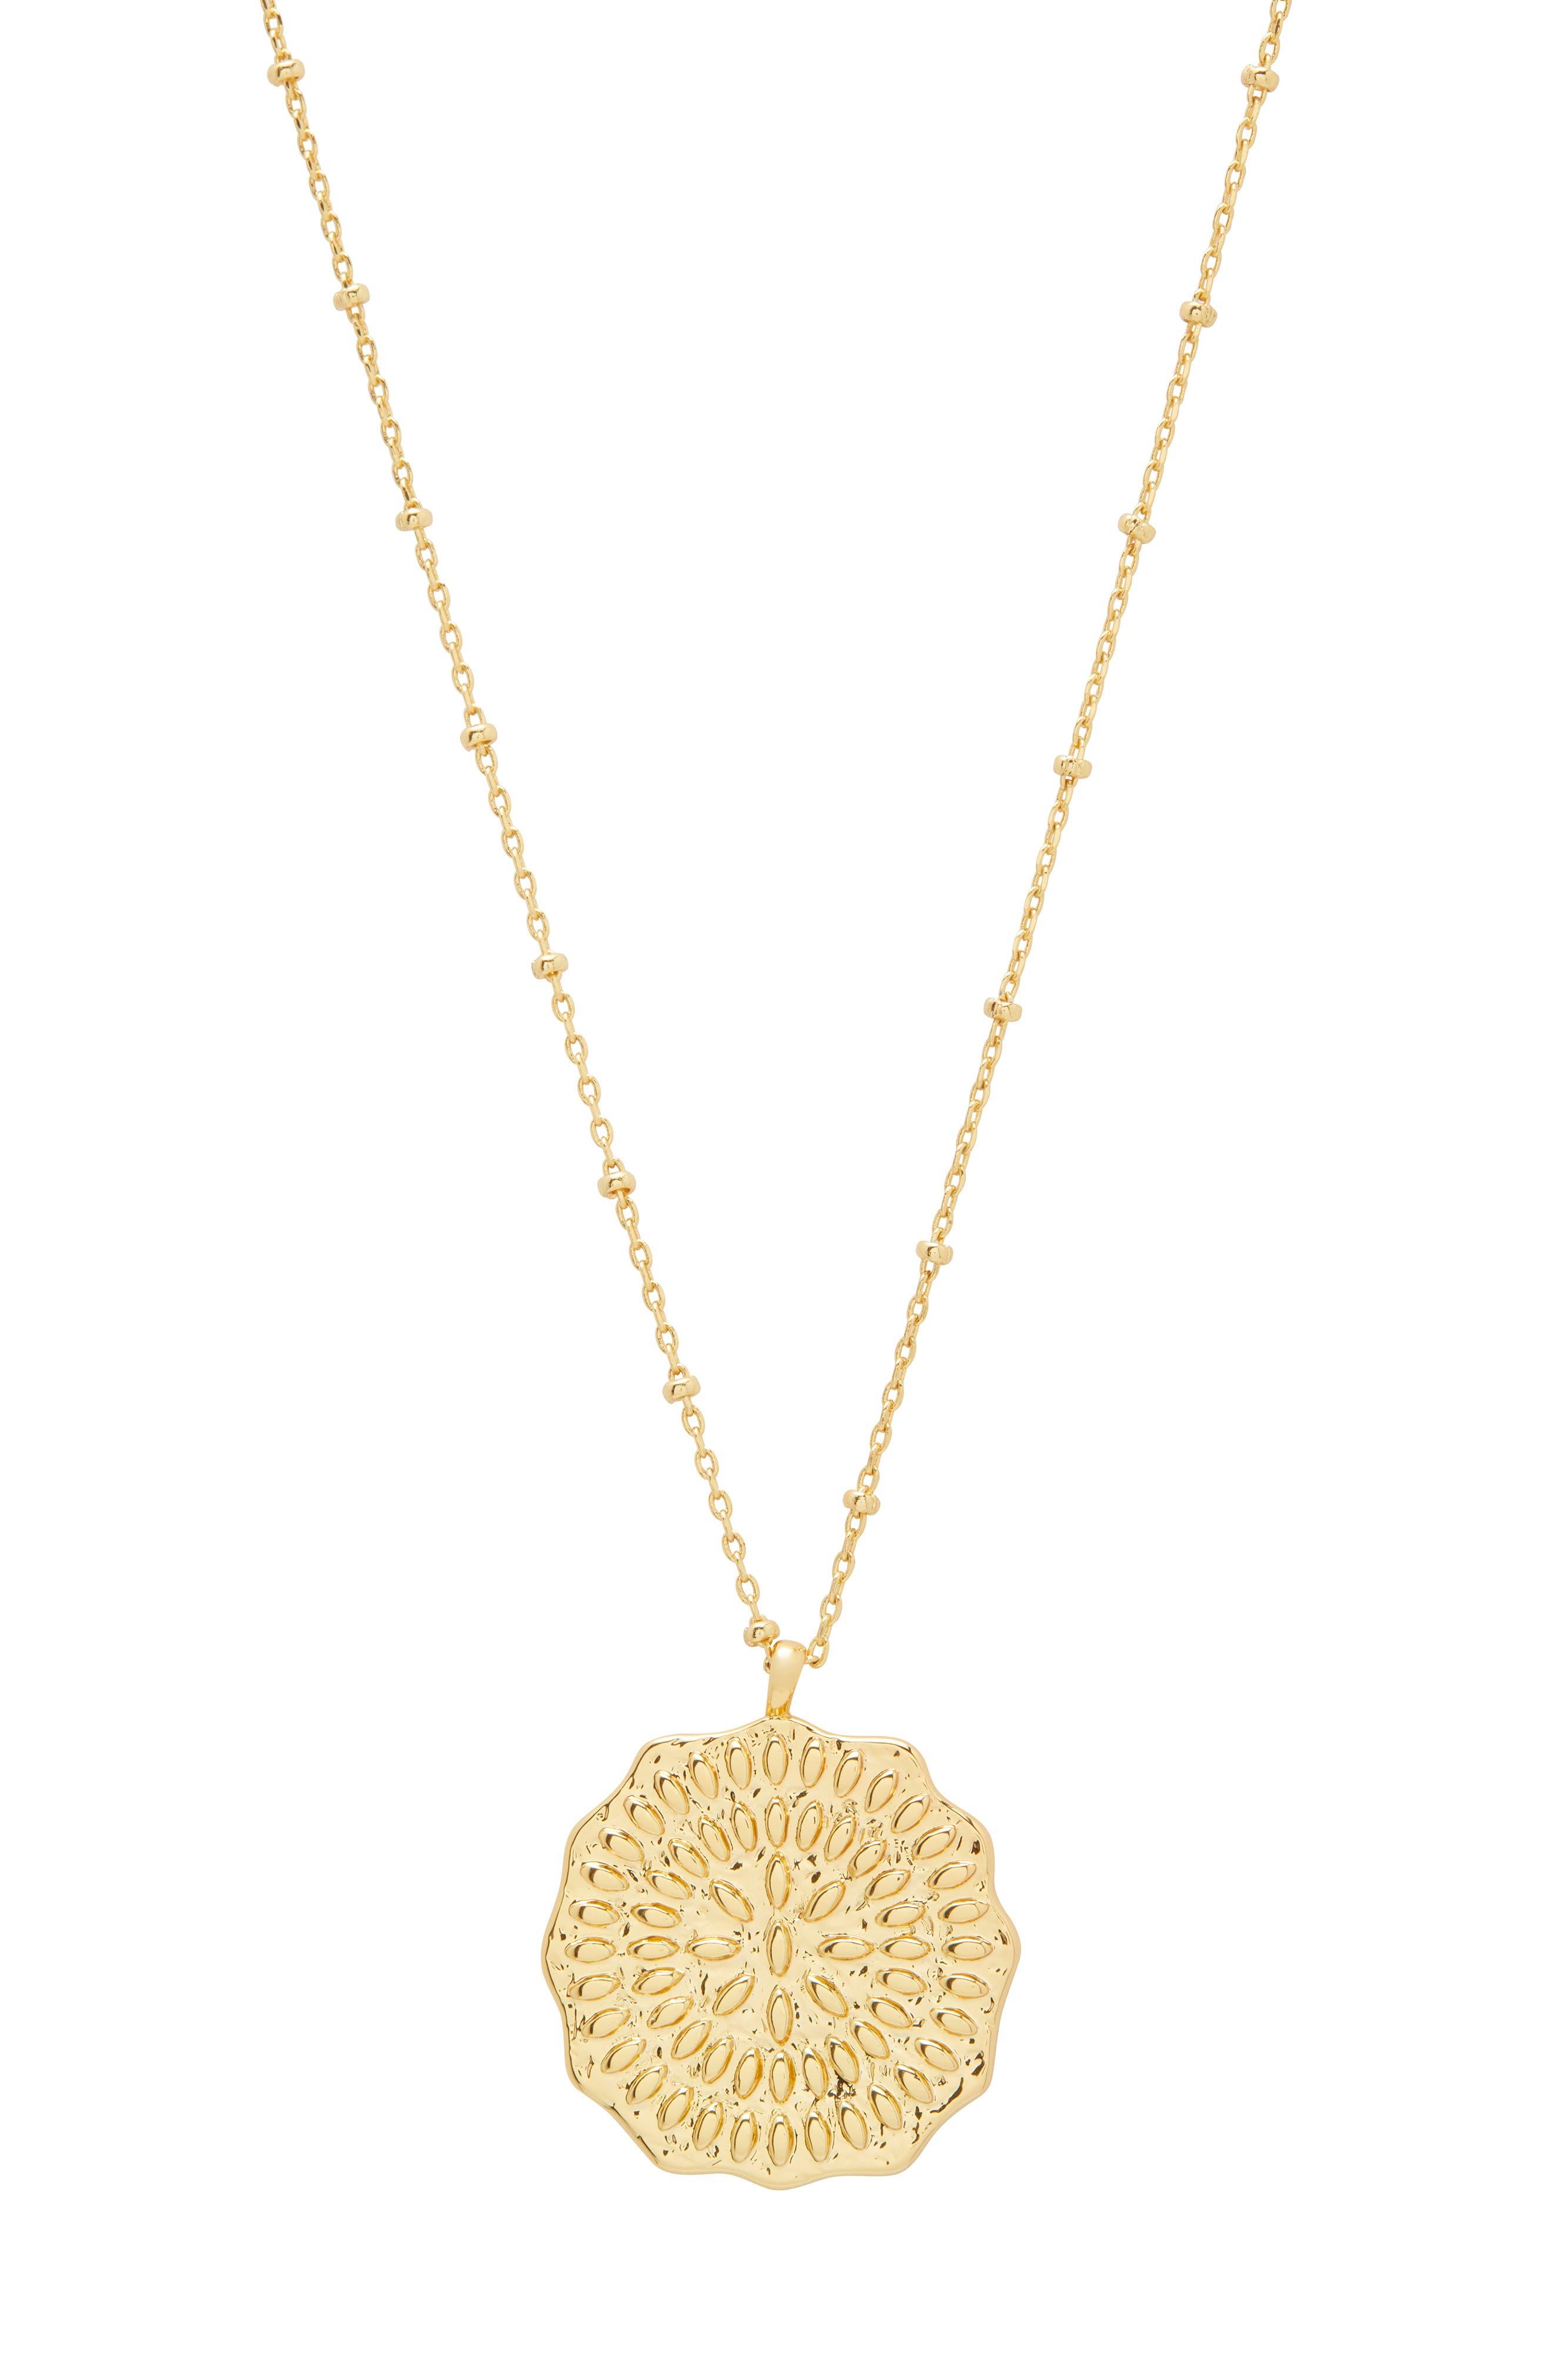 Mosaic Coin Pendant Necklace